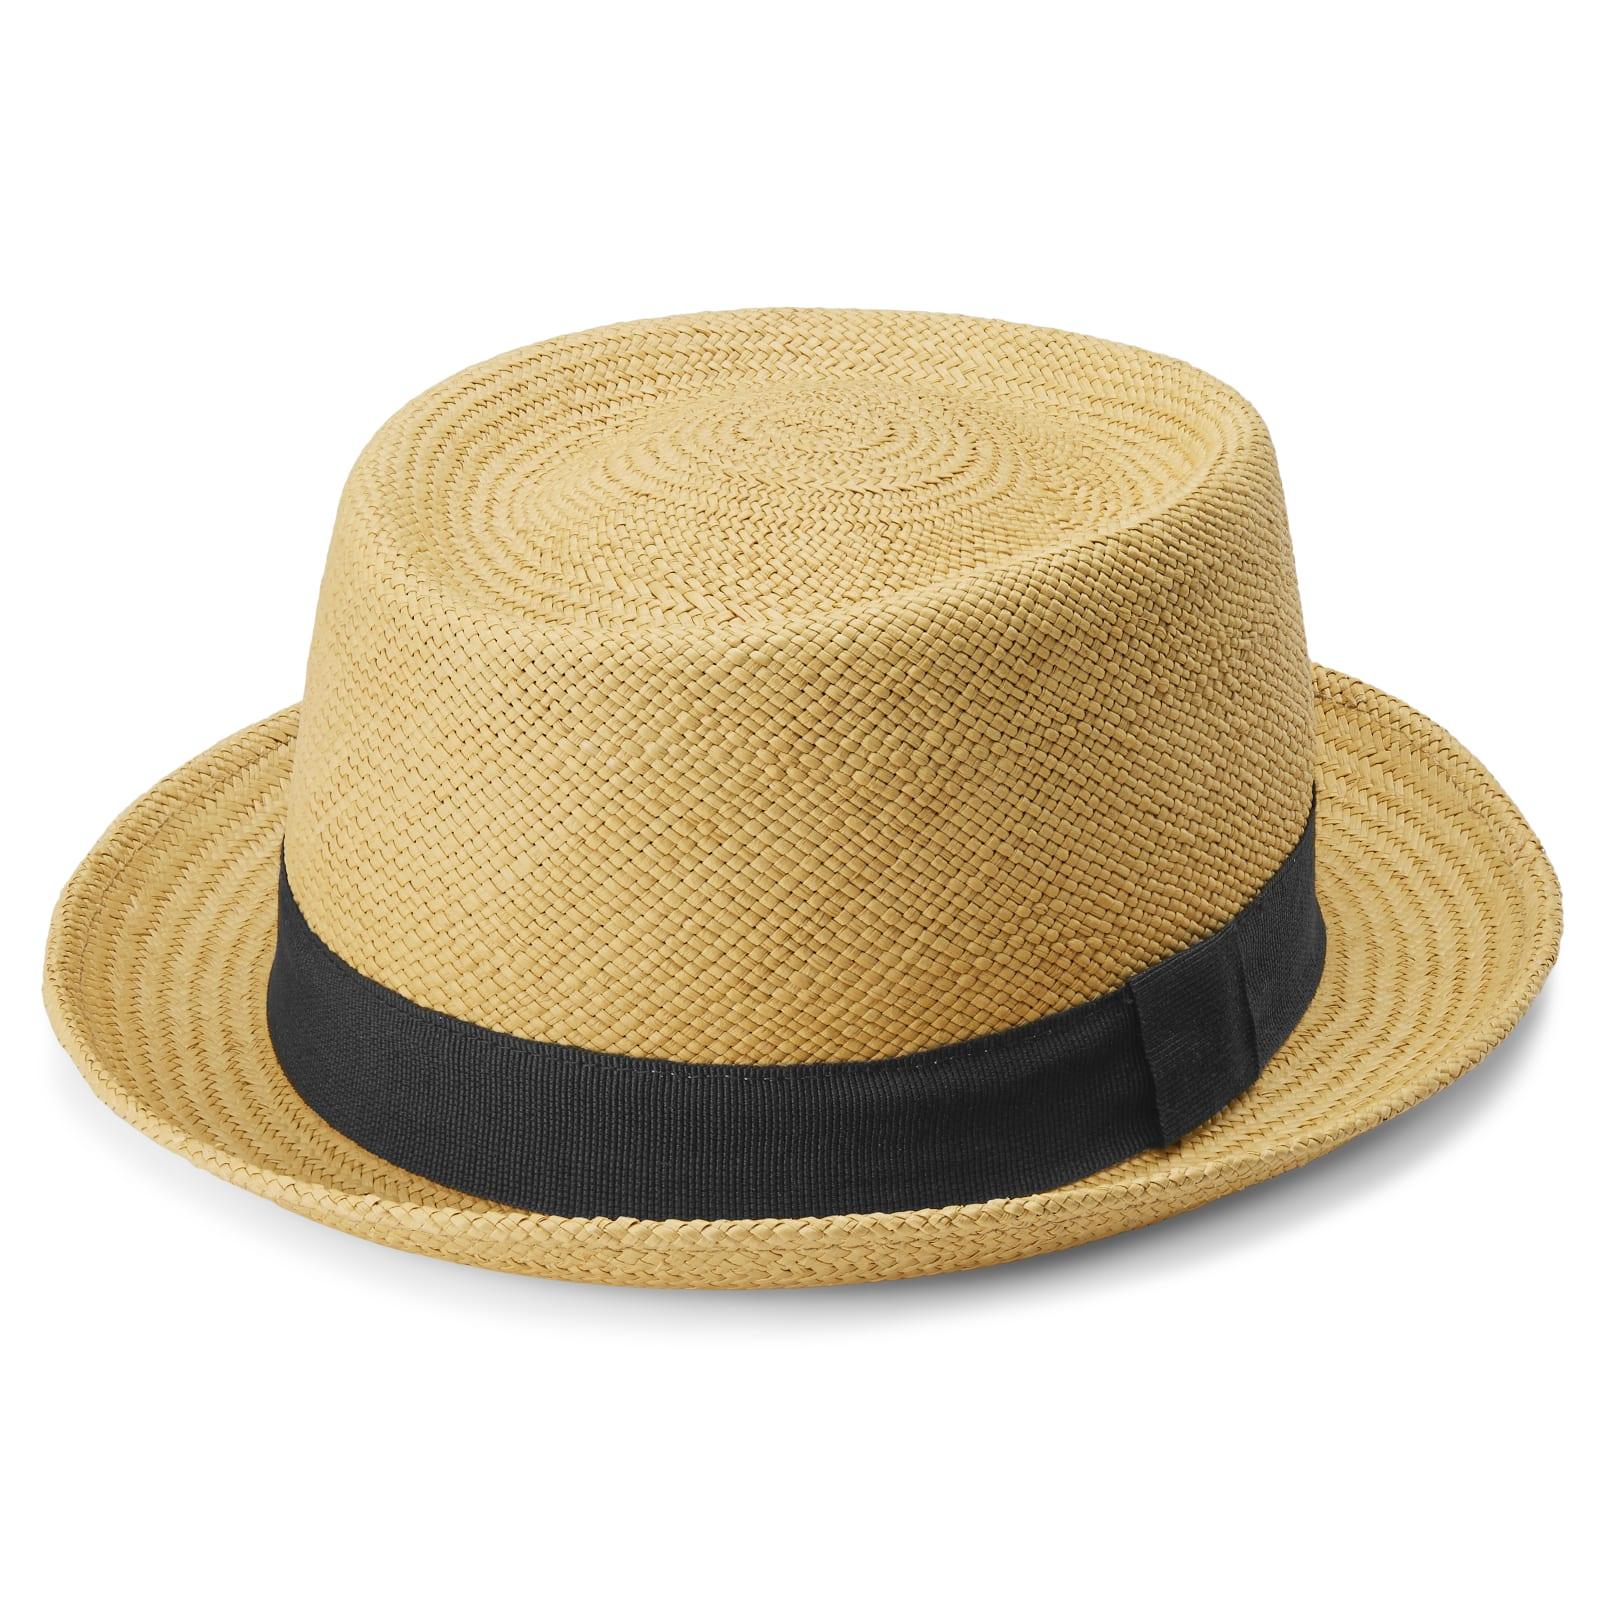 8a7a00f7137f08 Paolo Pork Pie Moda Panama Hat | Fawler | In stock!